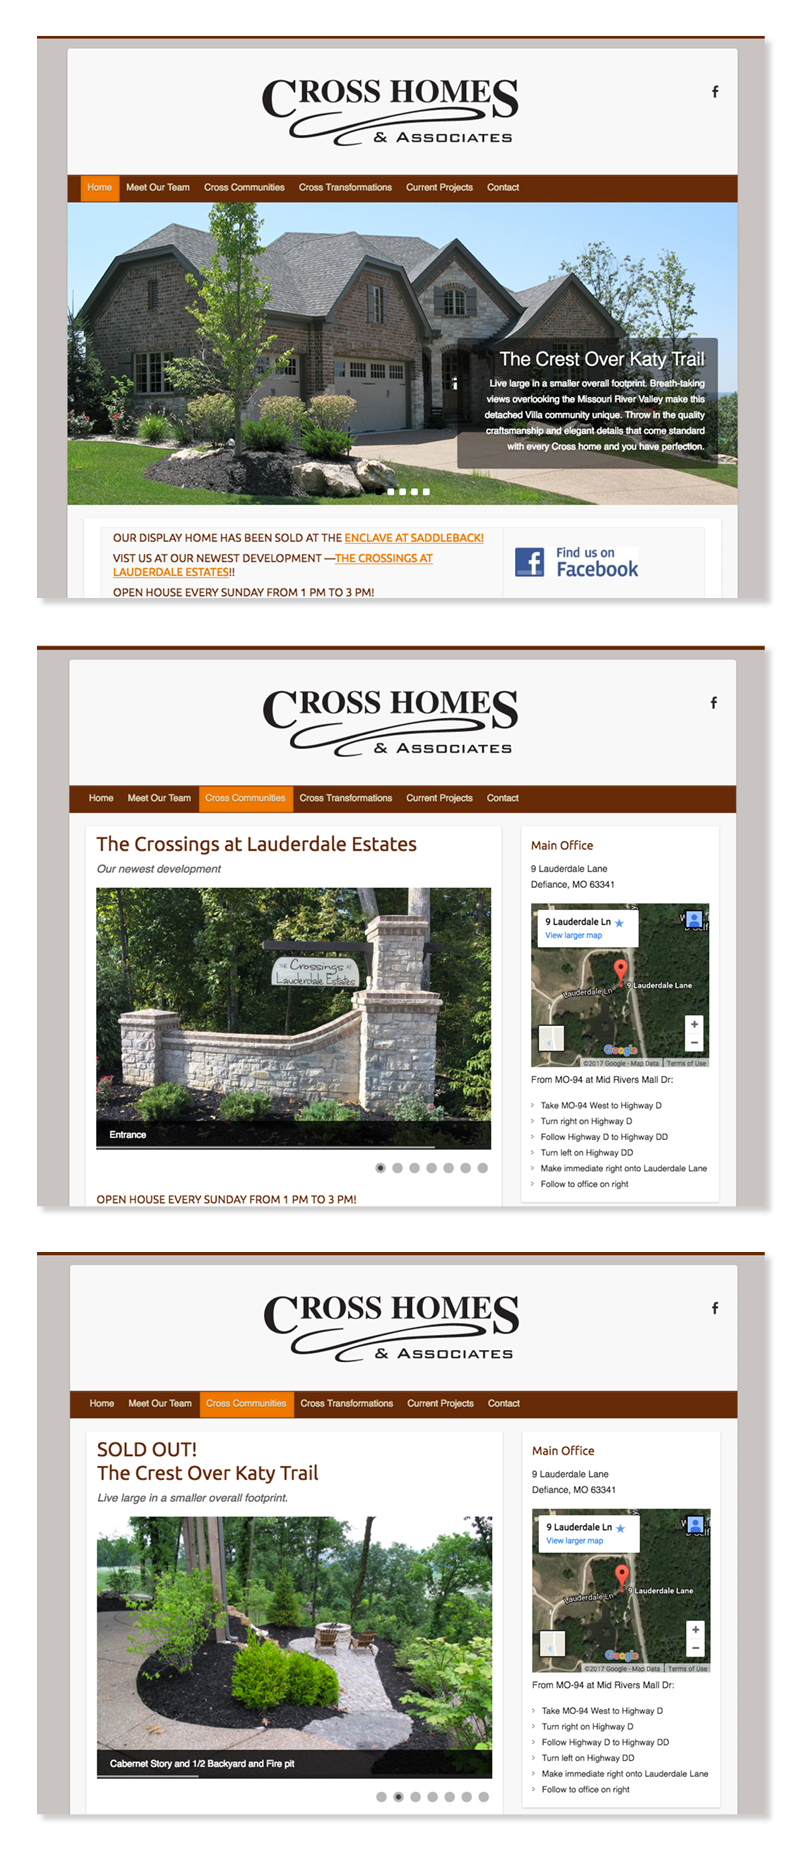 Cross Homes and Associates Website